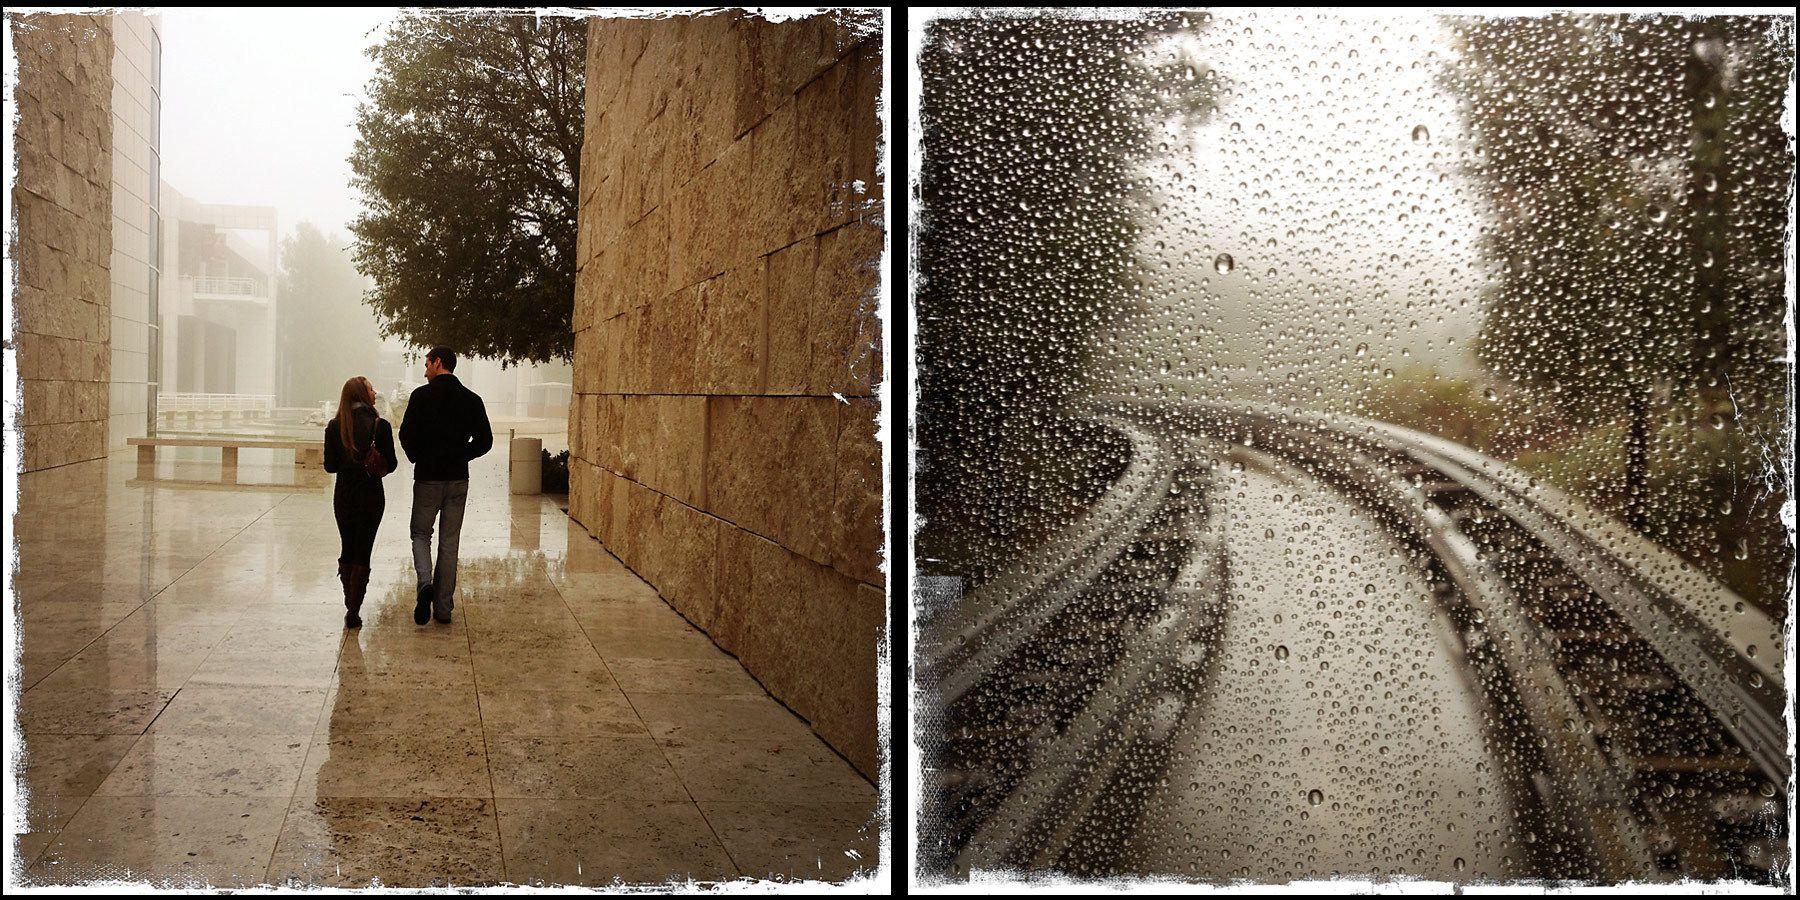 1getty_center_couple_walking_in_rain_rainy_tram.jpg